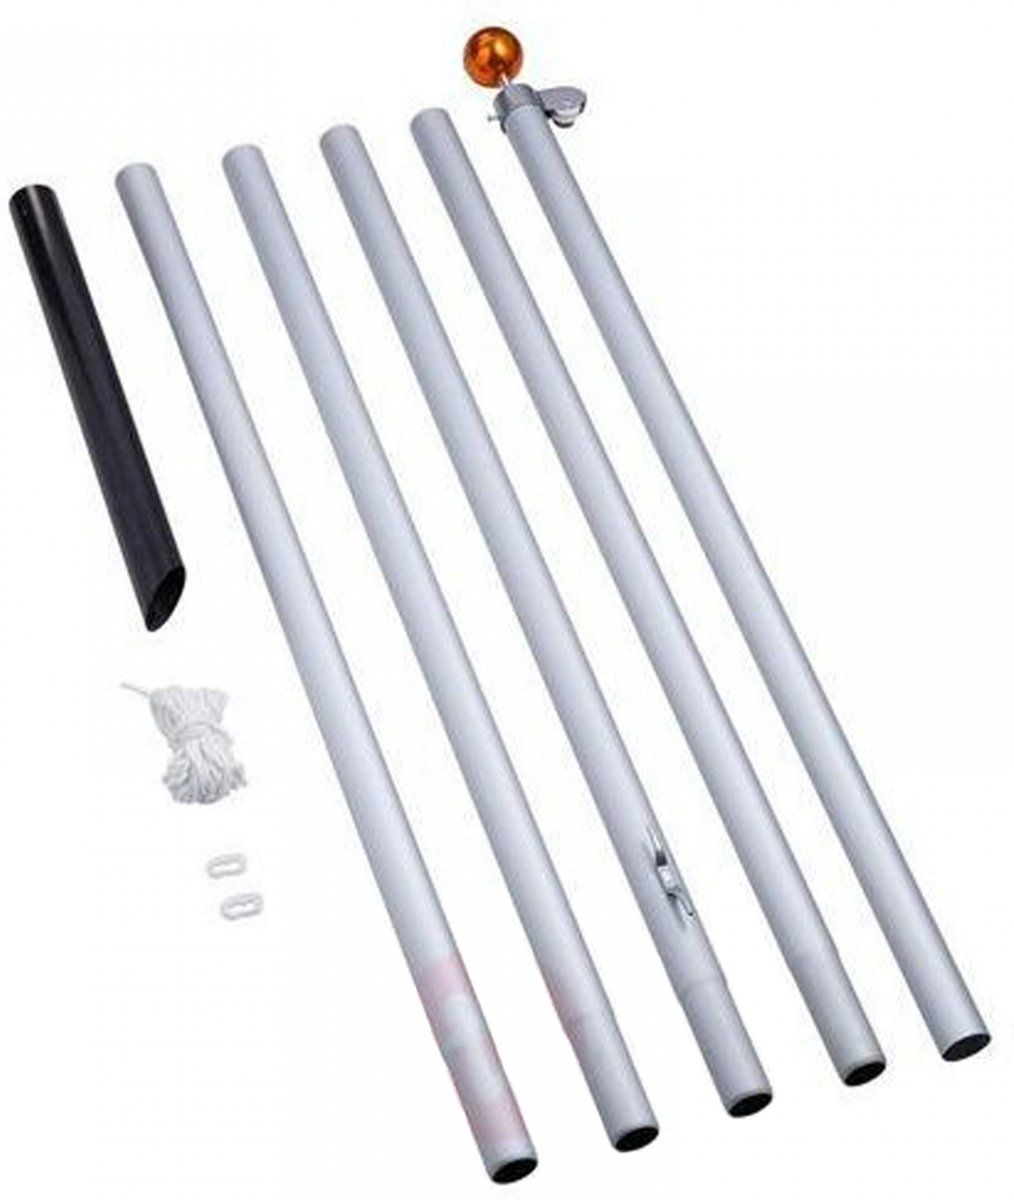 Fairybell - Deelbare vlaggenmast - Zilver - 600cm kopen